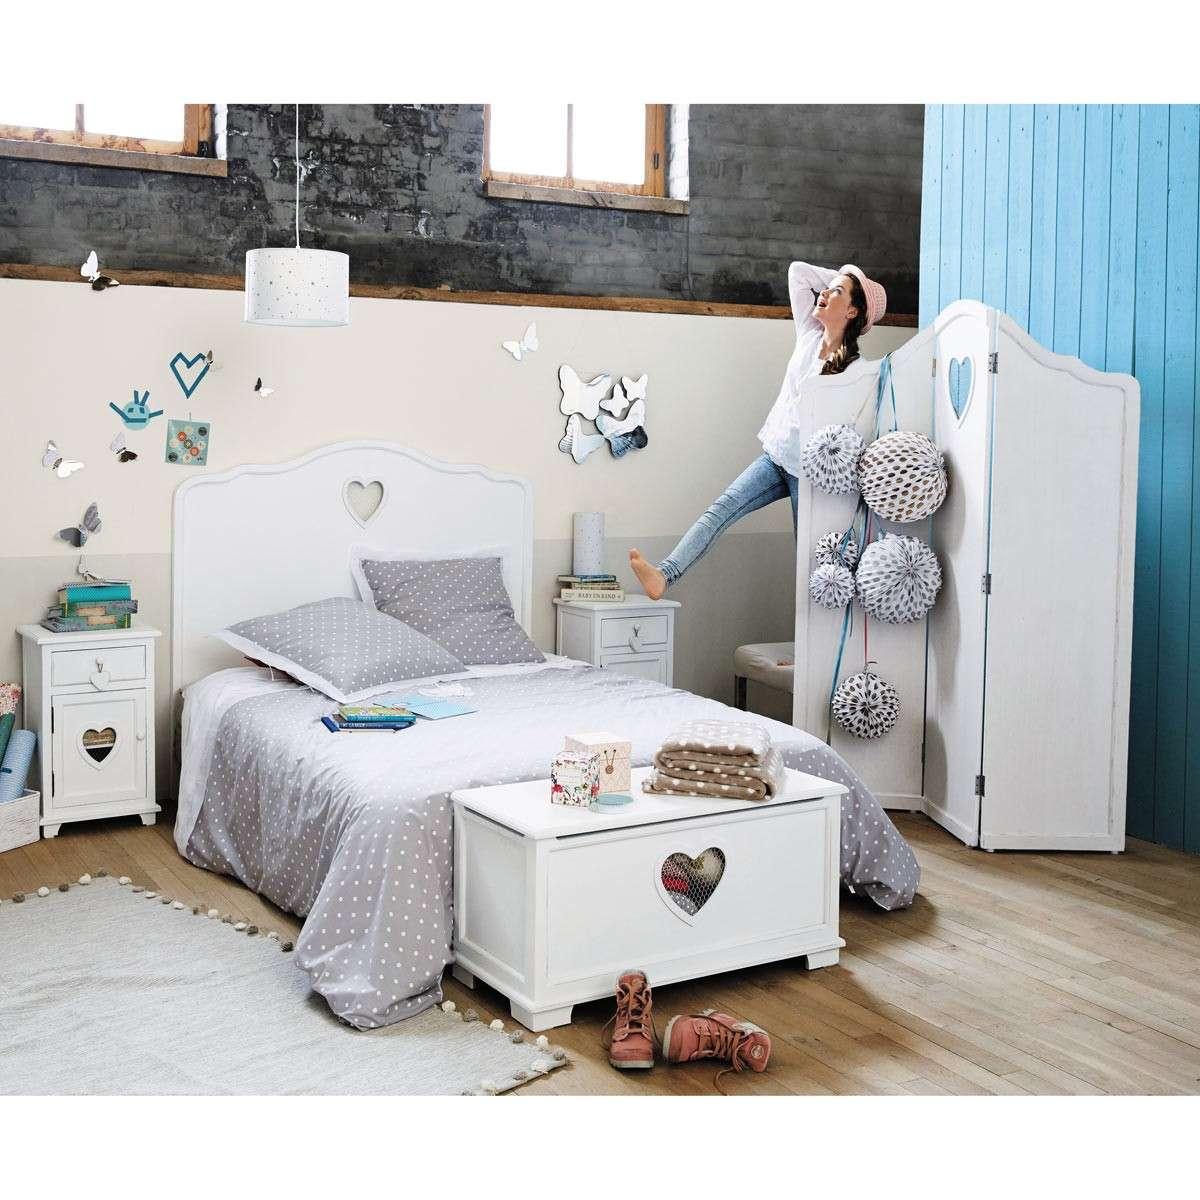 camerette per bambini maisons du monde foto mamma pourfemme. Black Bedroom Furniture Sets. Home Design Ideas